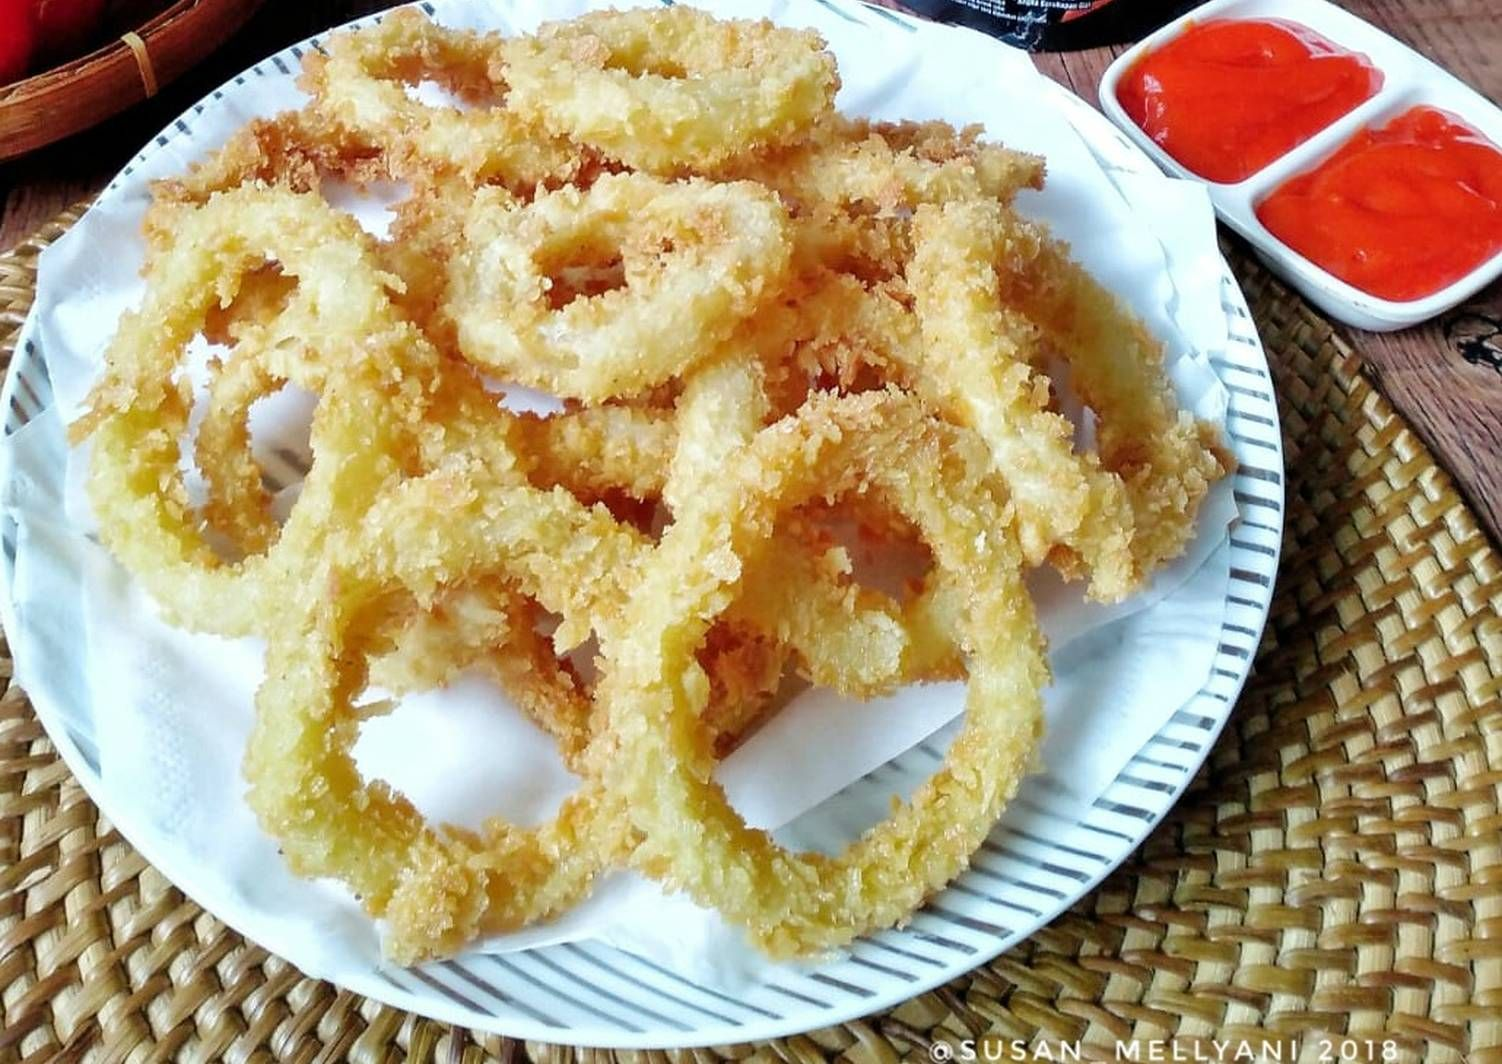 Resep Onion Rings Oleh Susan Mellyani Resep Resep Makanan Resep Saus Sambal